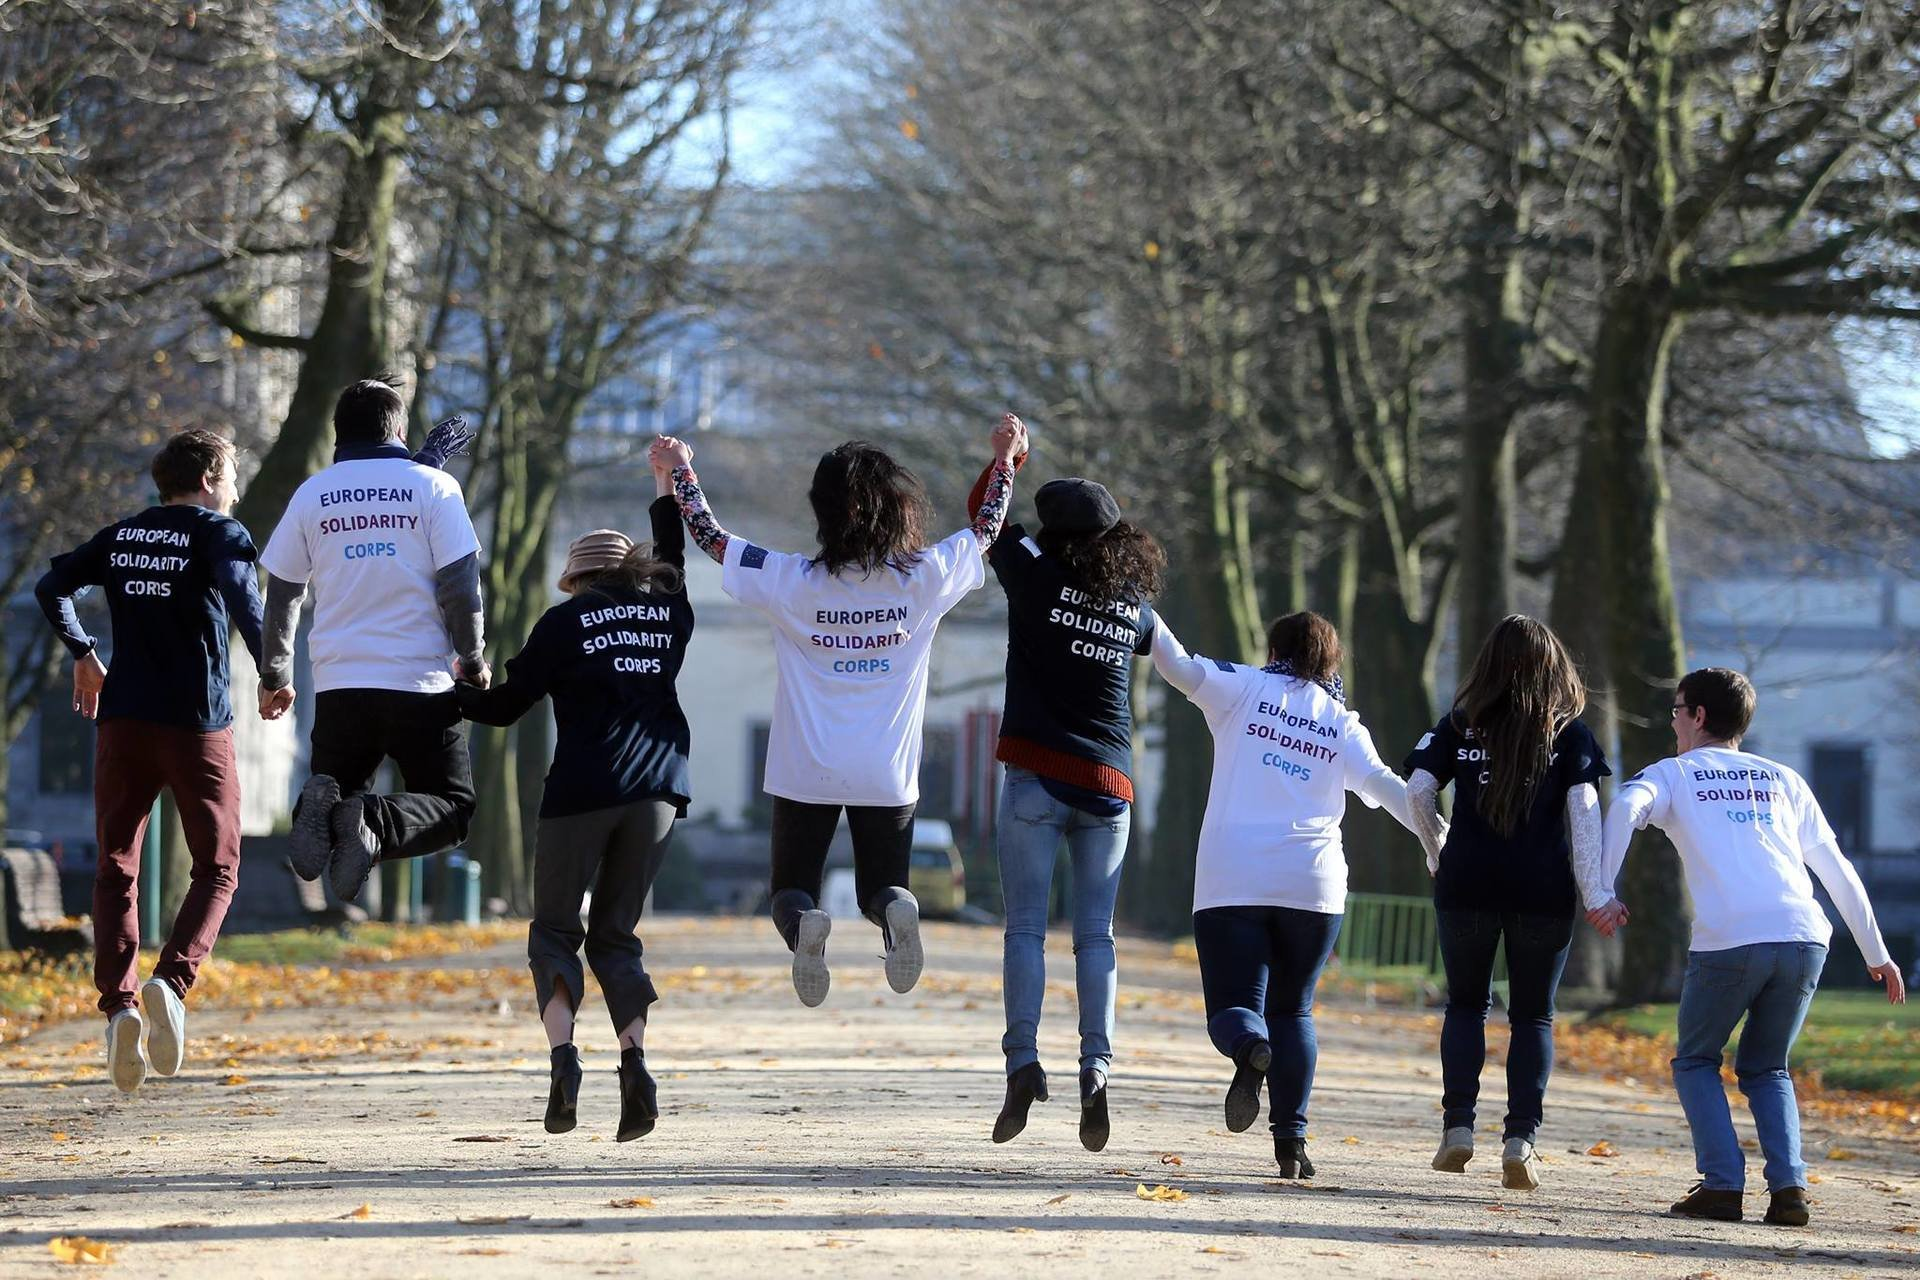 Konferencja inaugurująca Europejski Korpus Solidarności